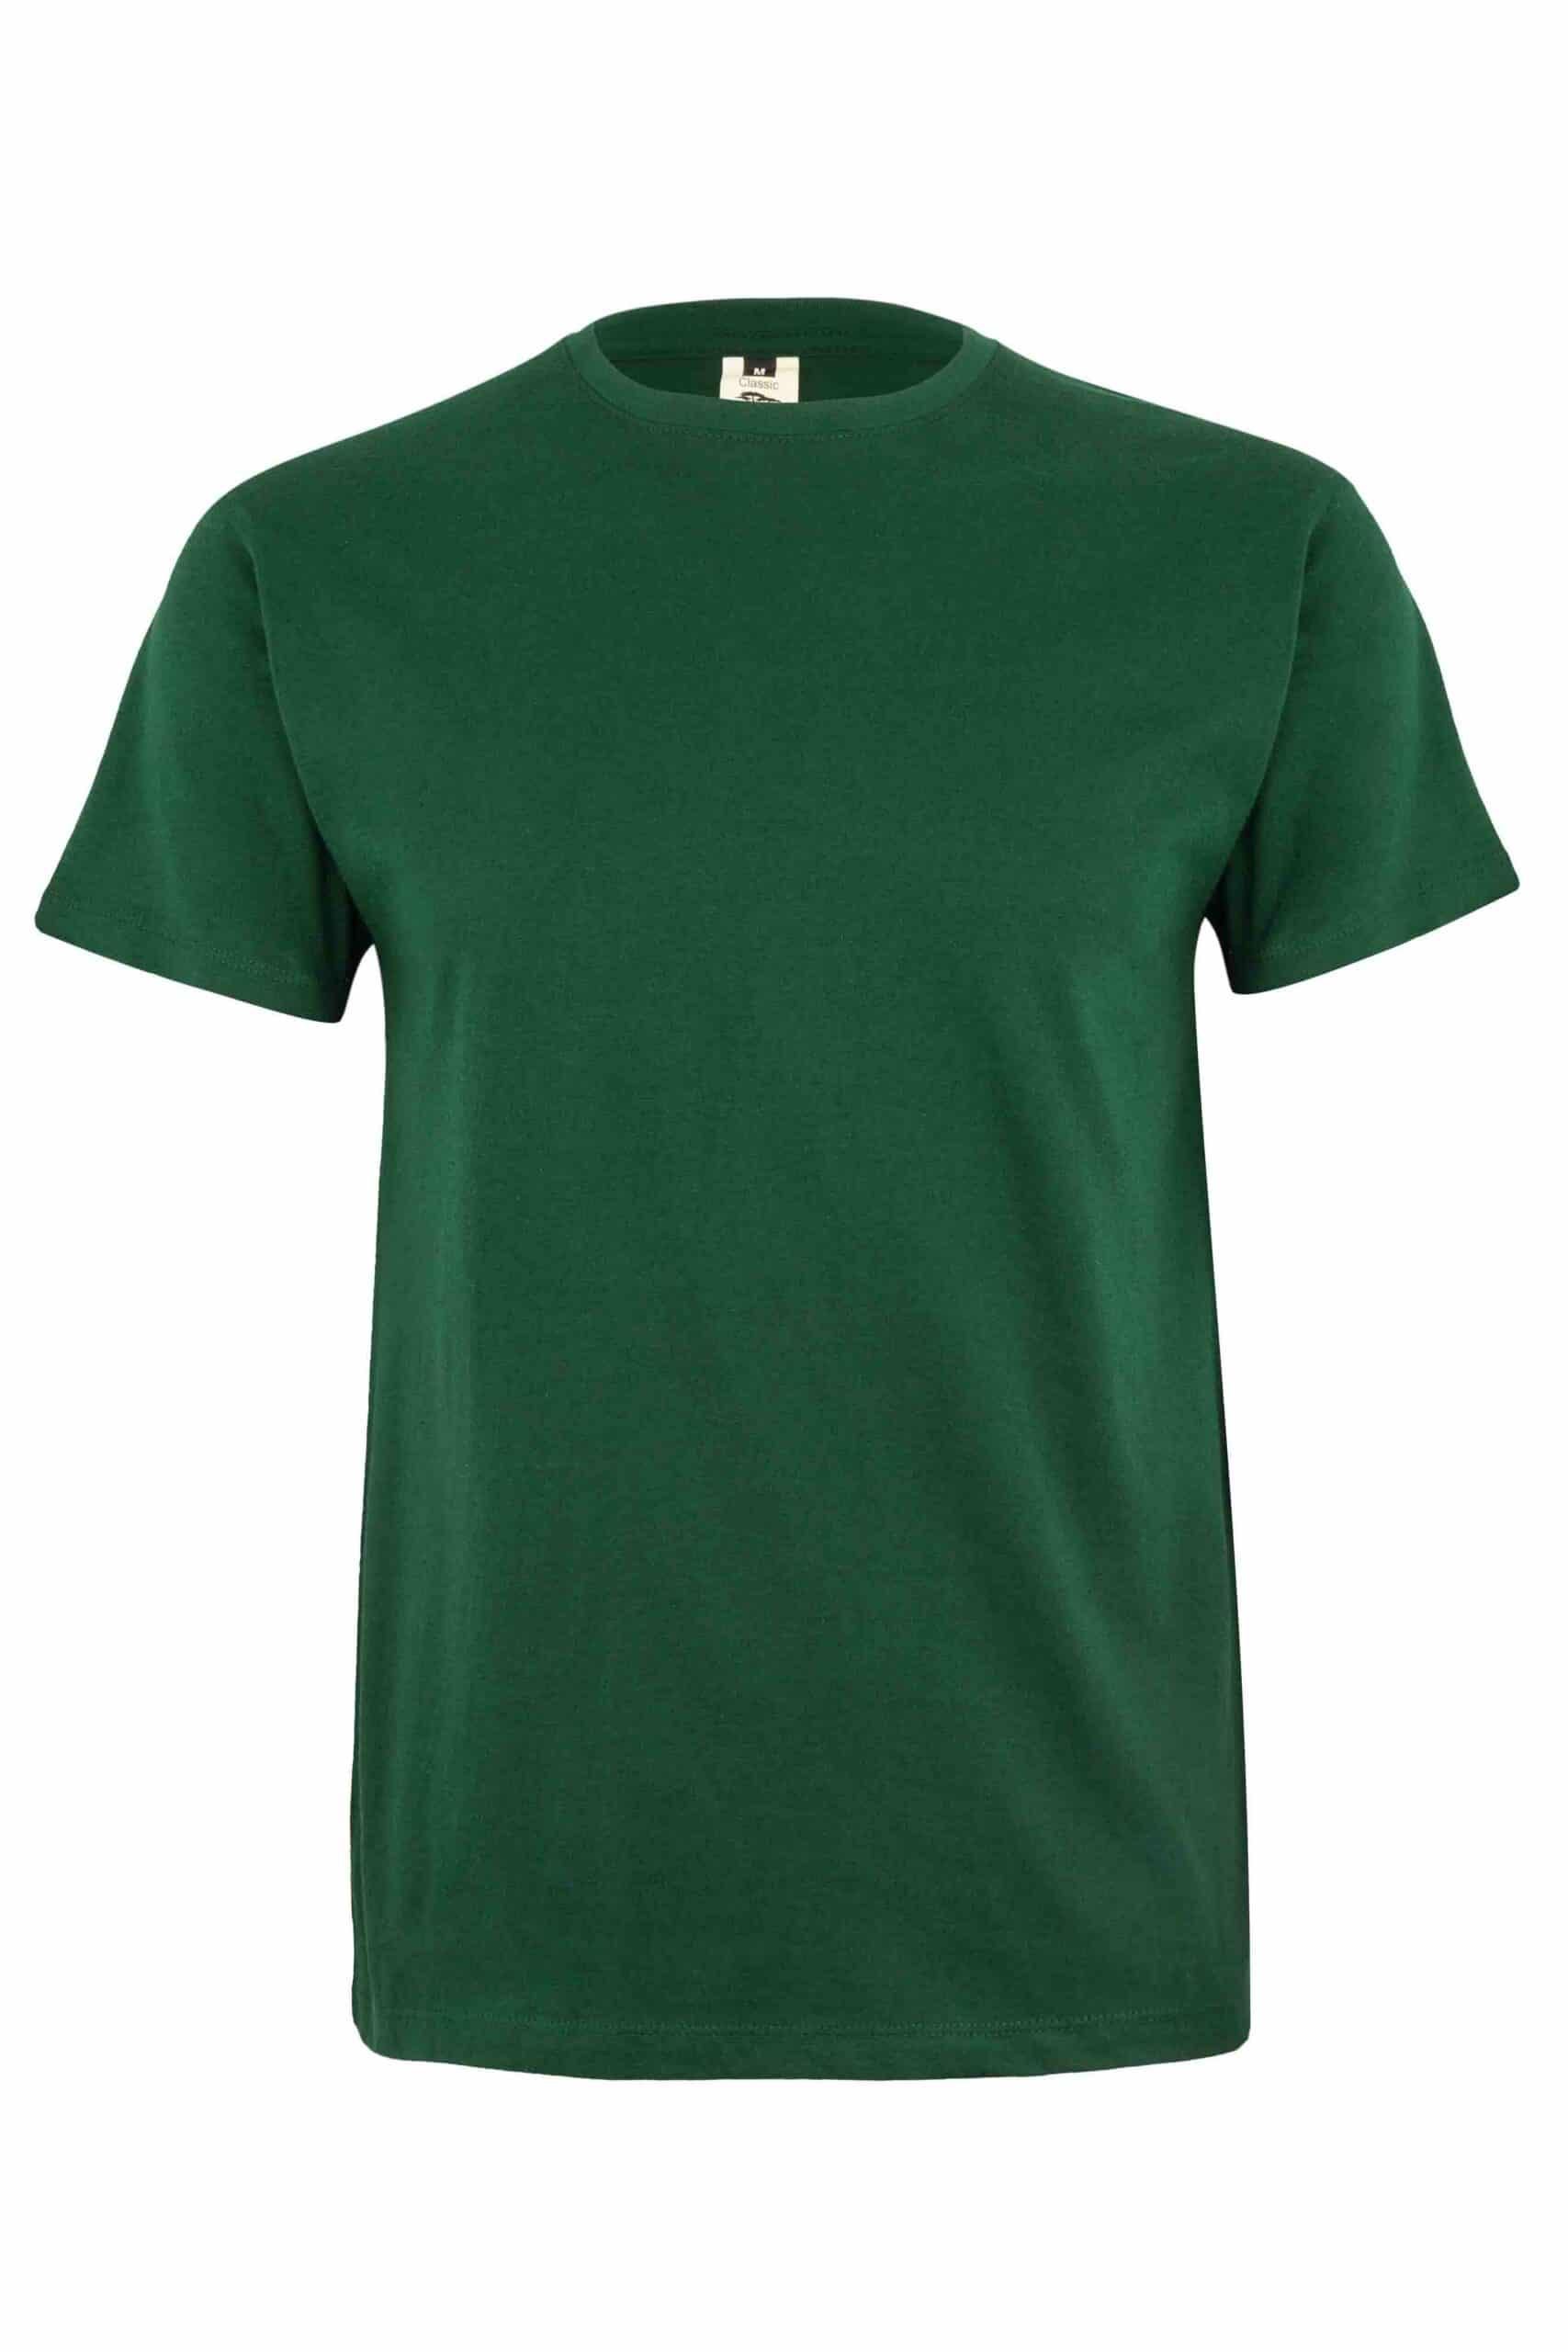 Mukua Mk022cv Camiseta Manga Corta 150gr Bottle Green